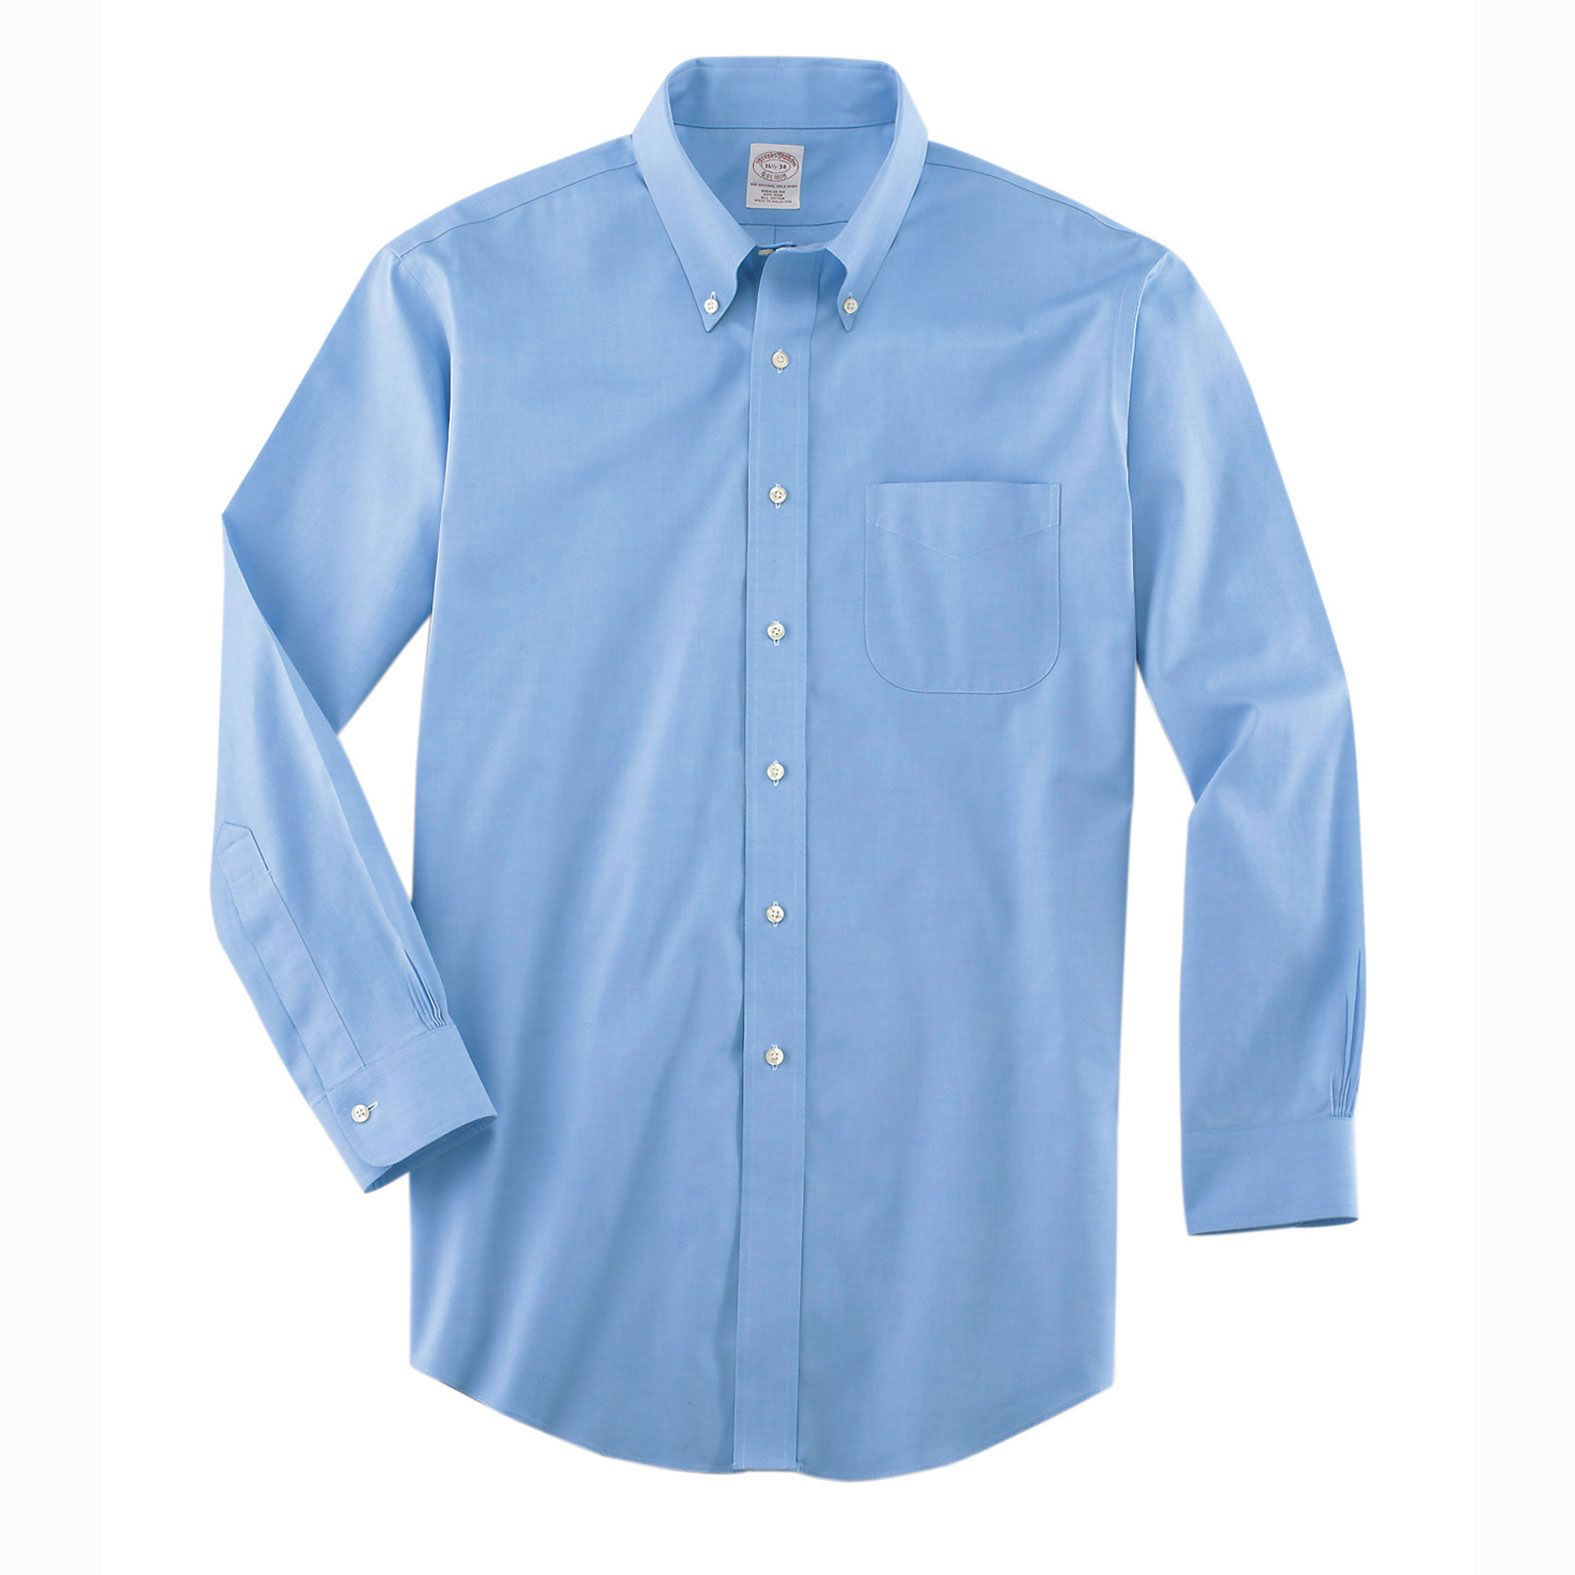 Blue Dress Shirt Clip Art Festive inspirations for the new.